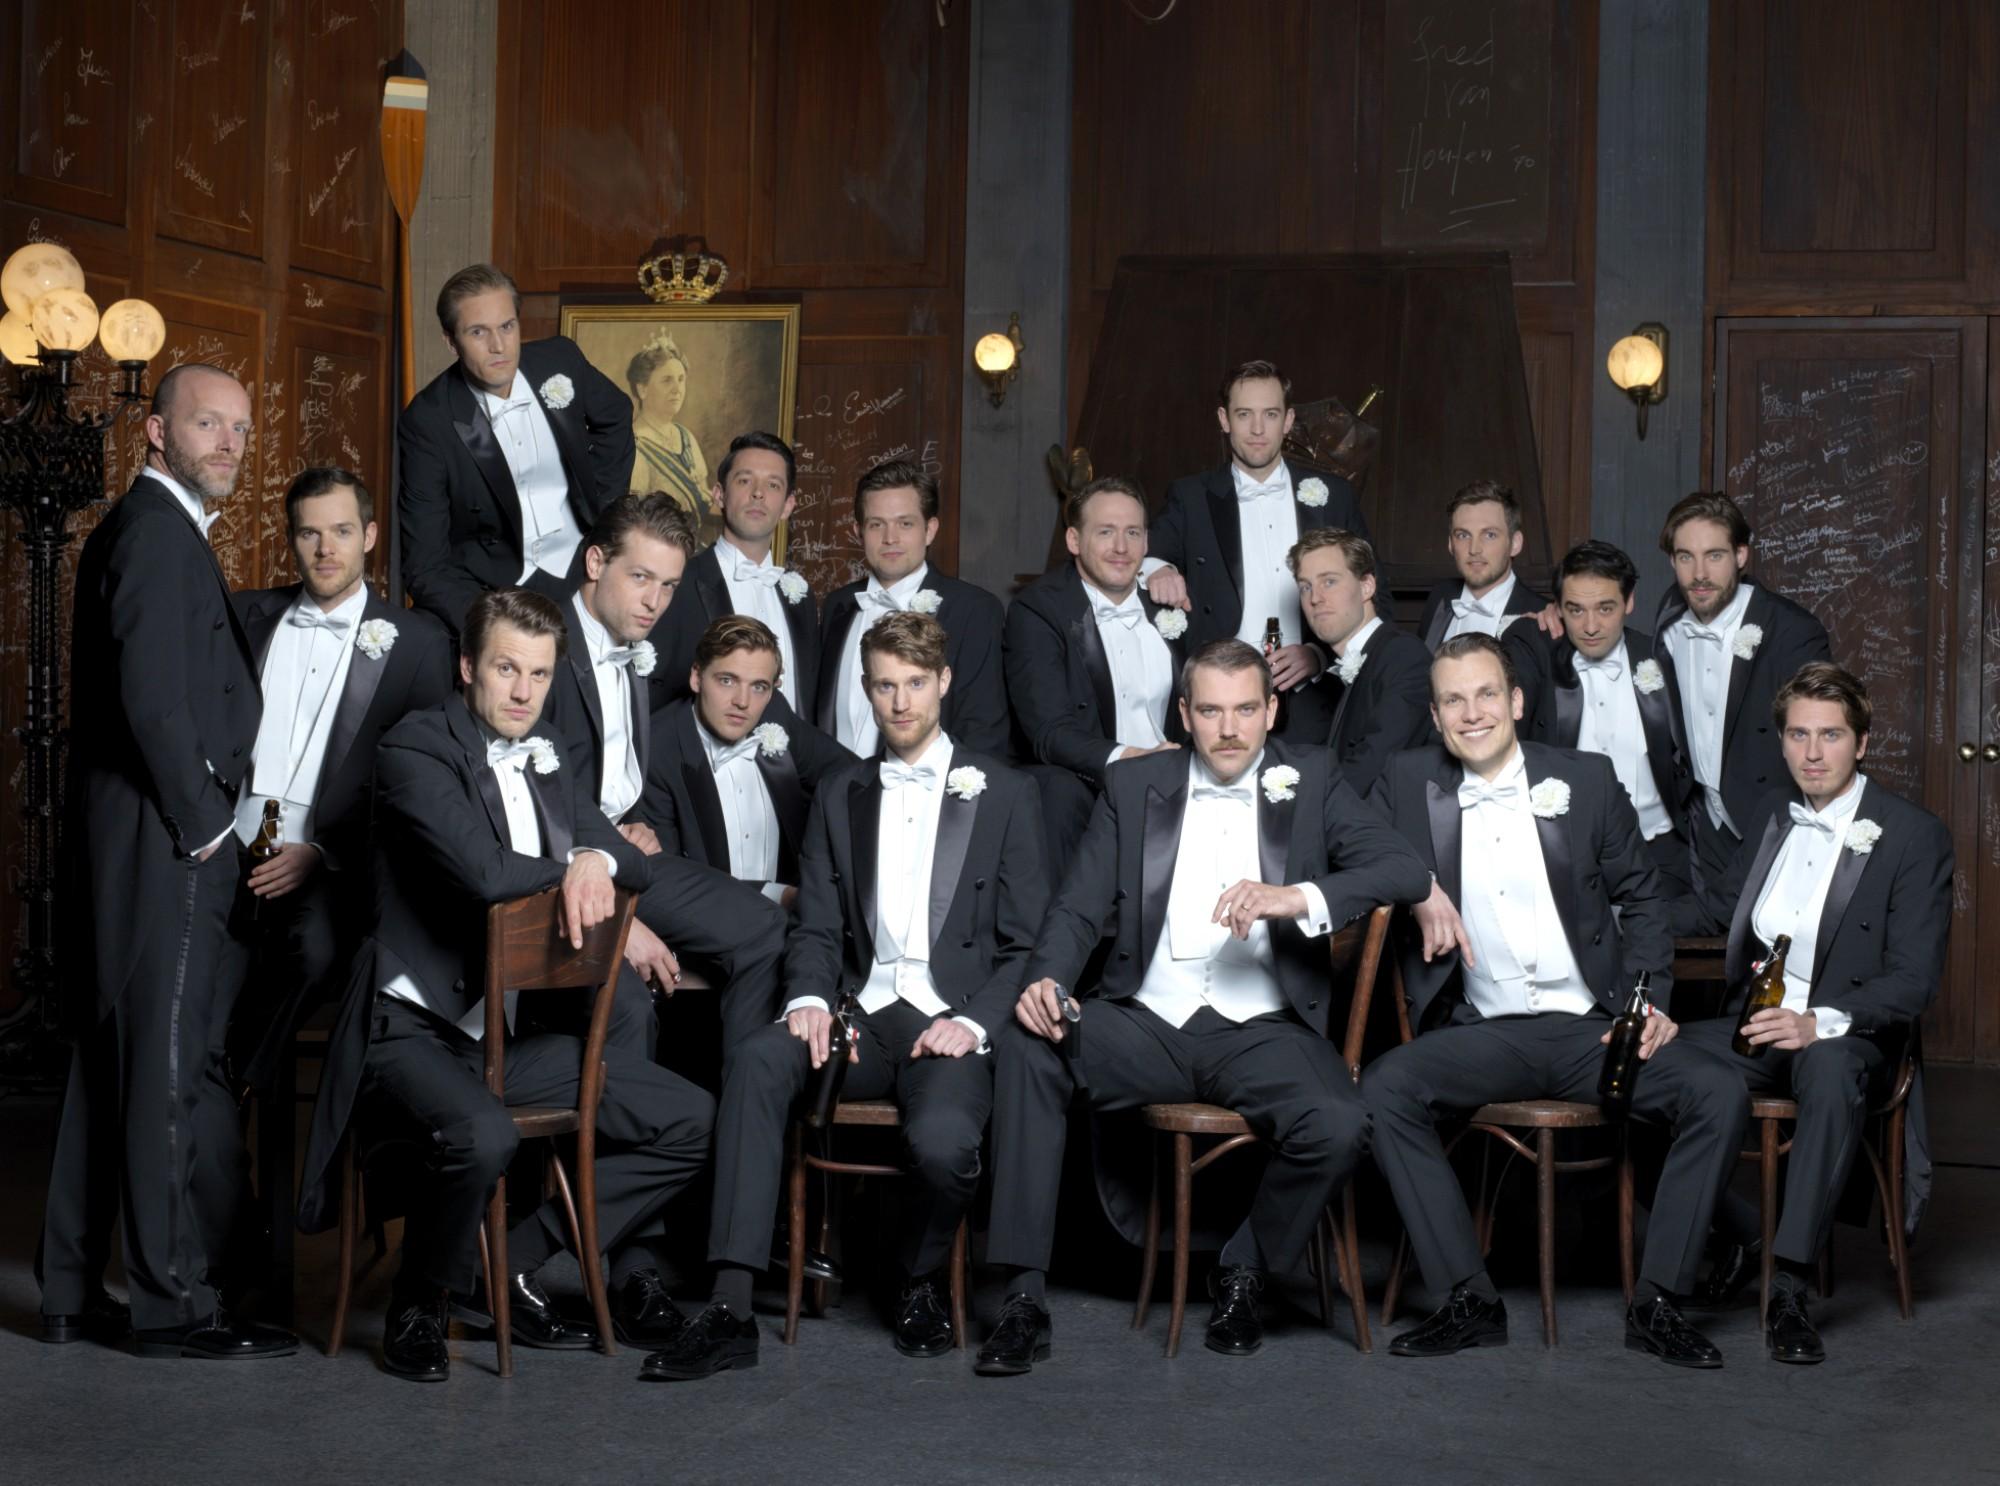 Soldaat van Oranje - De Musical viert 100ste geboortedag Erik Hazelhoff Roelfzema